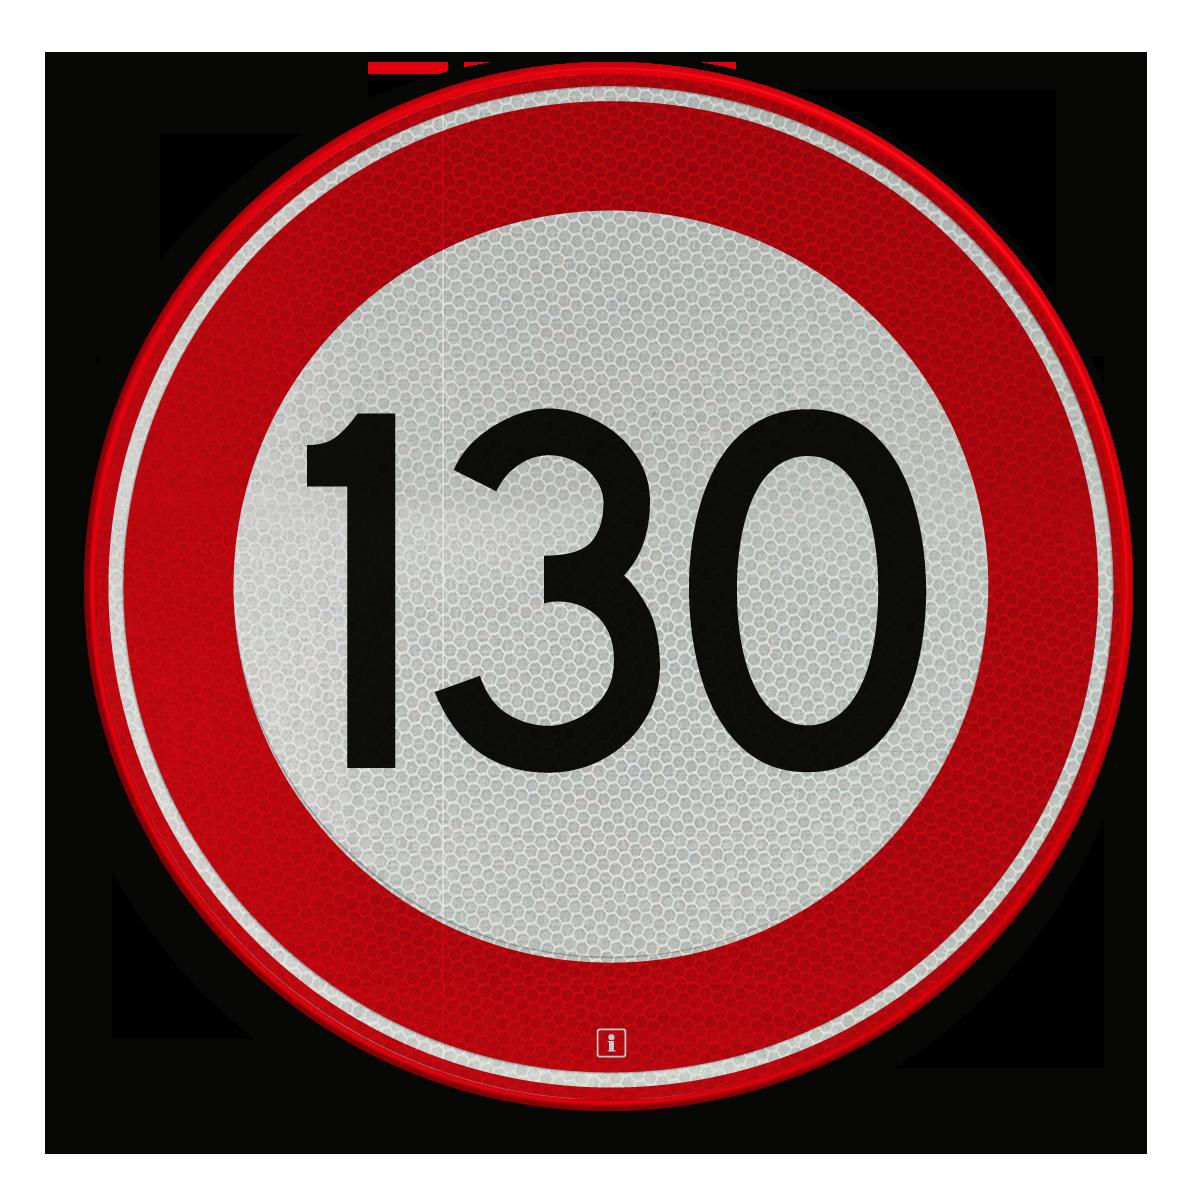 OR 130